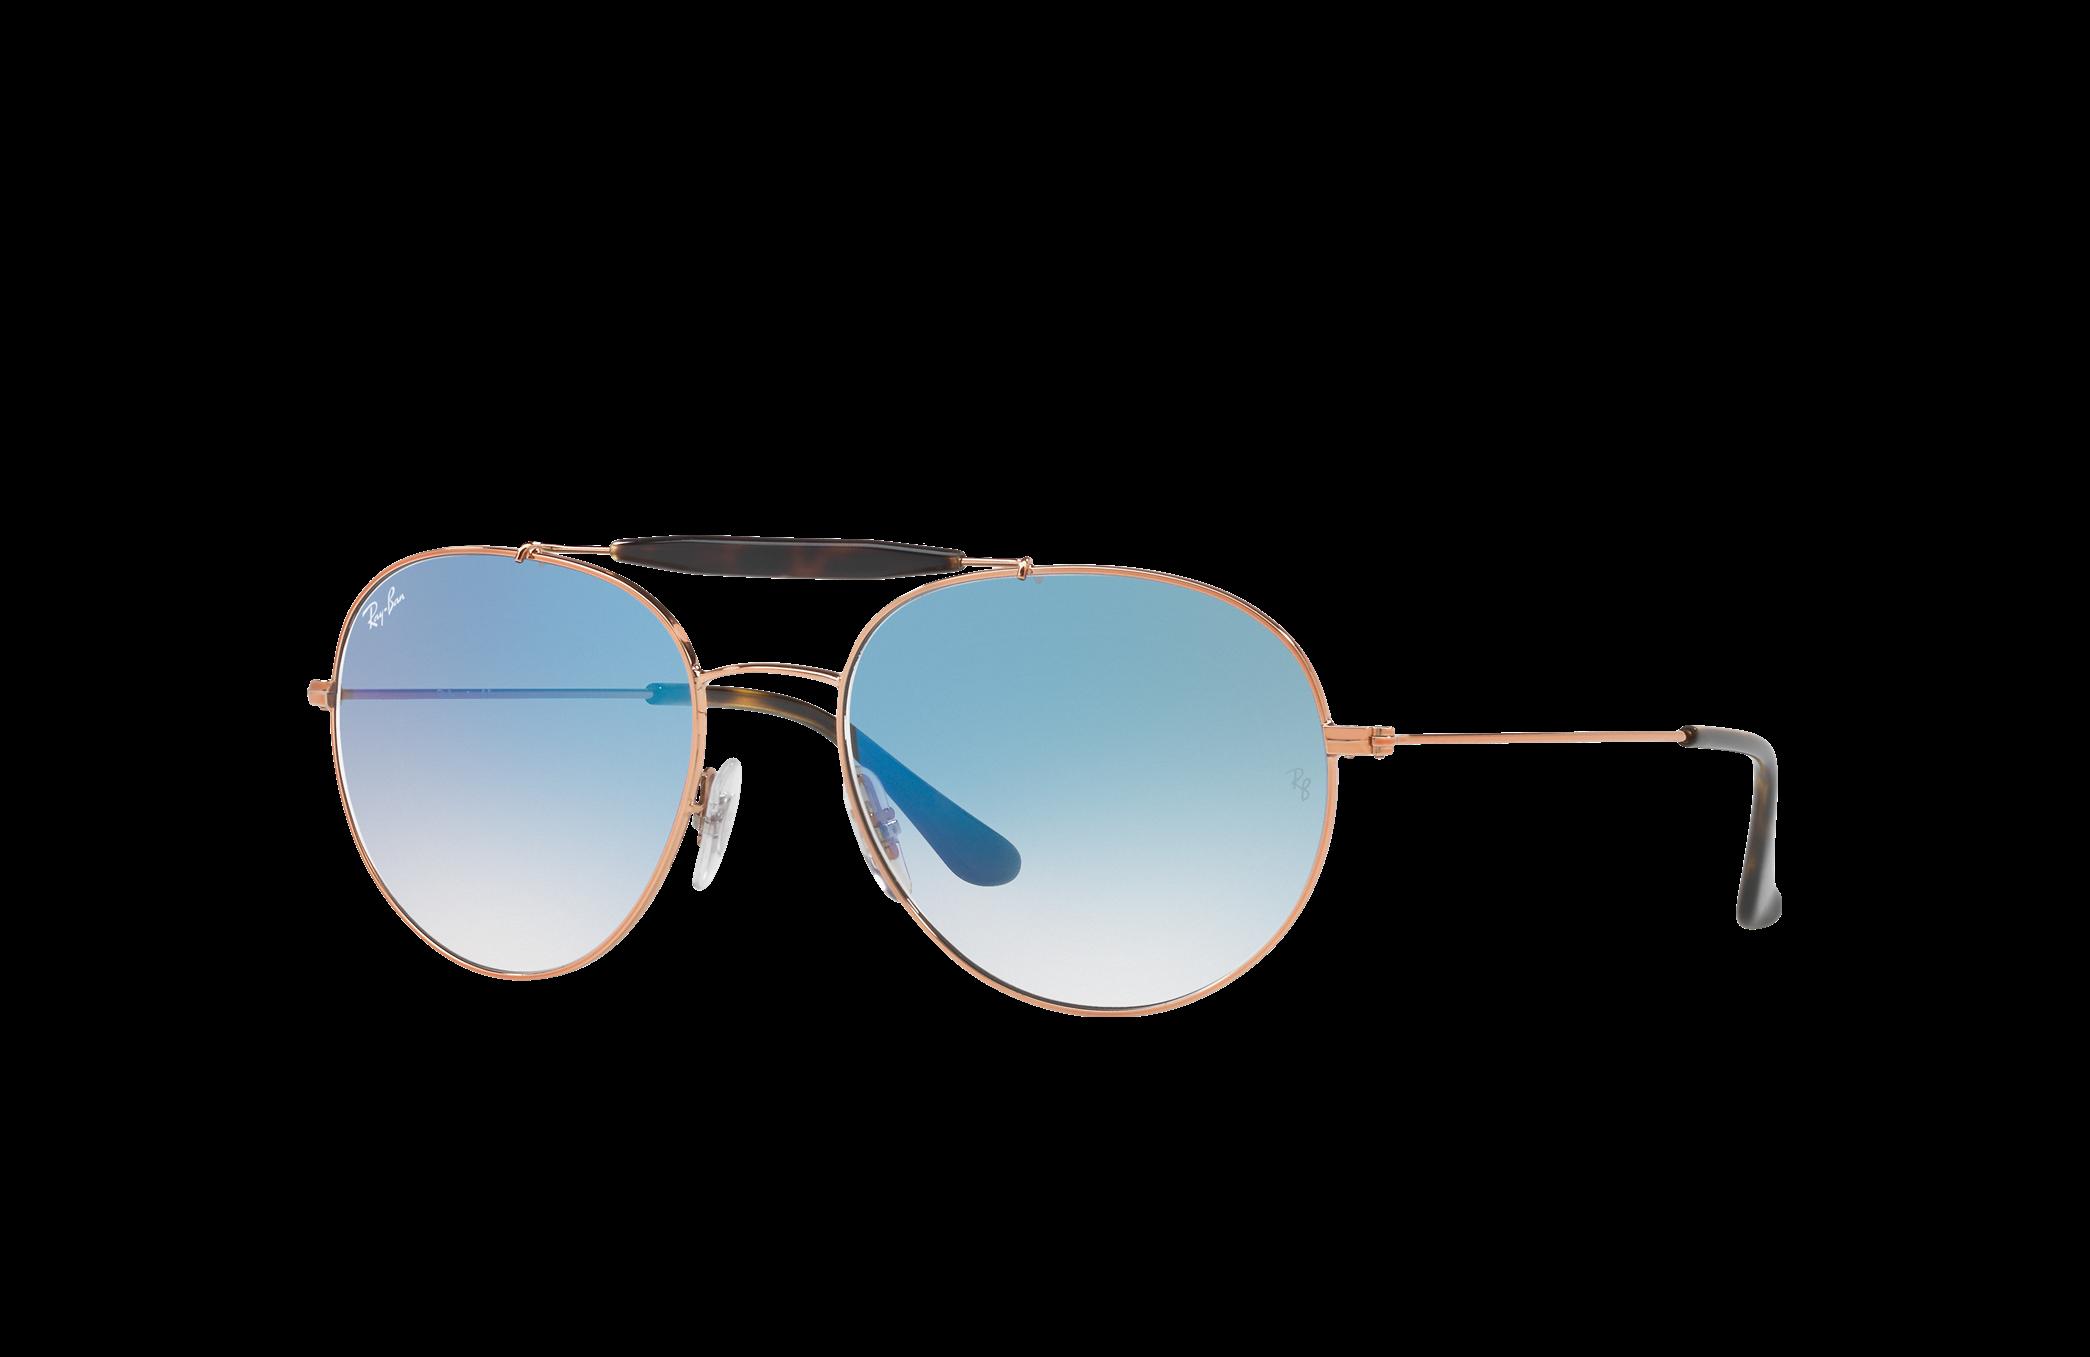 Ray-Ban Rb3540 Bronze-Copper, Blue Lenses - RB3540